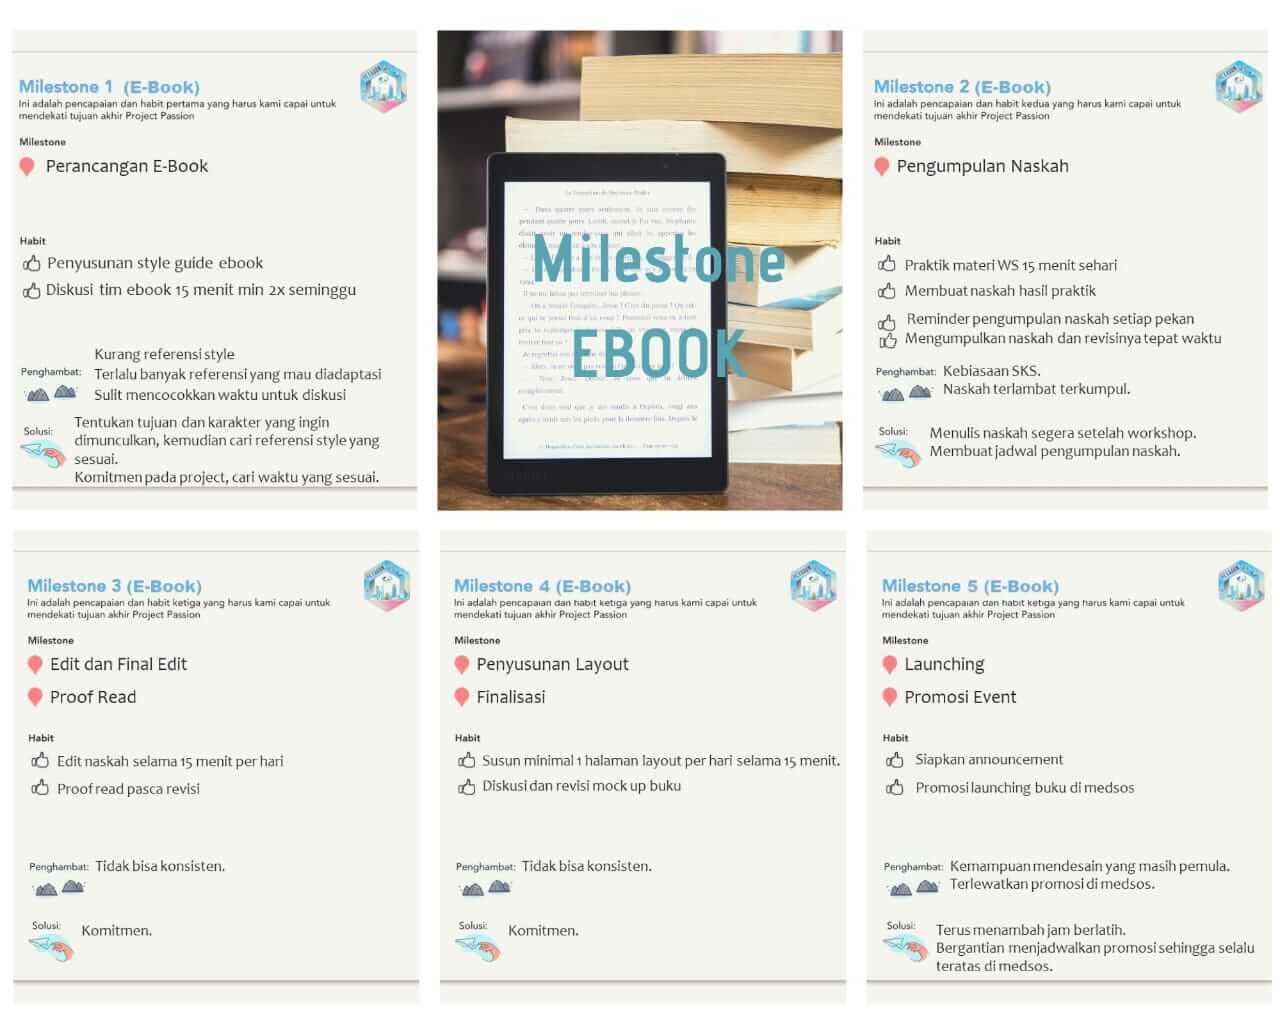 milestone e book analekta